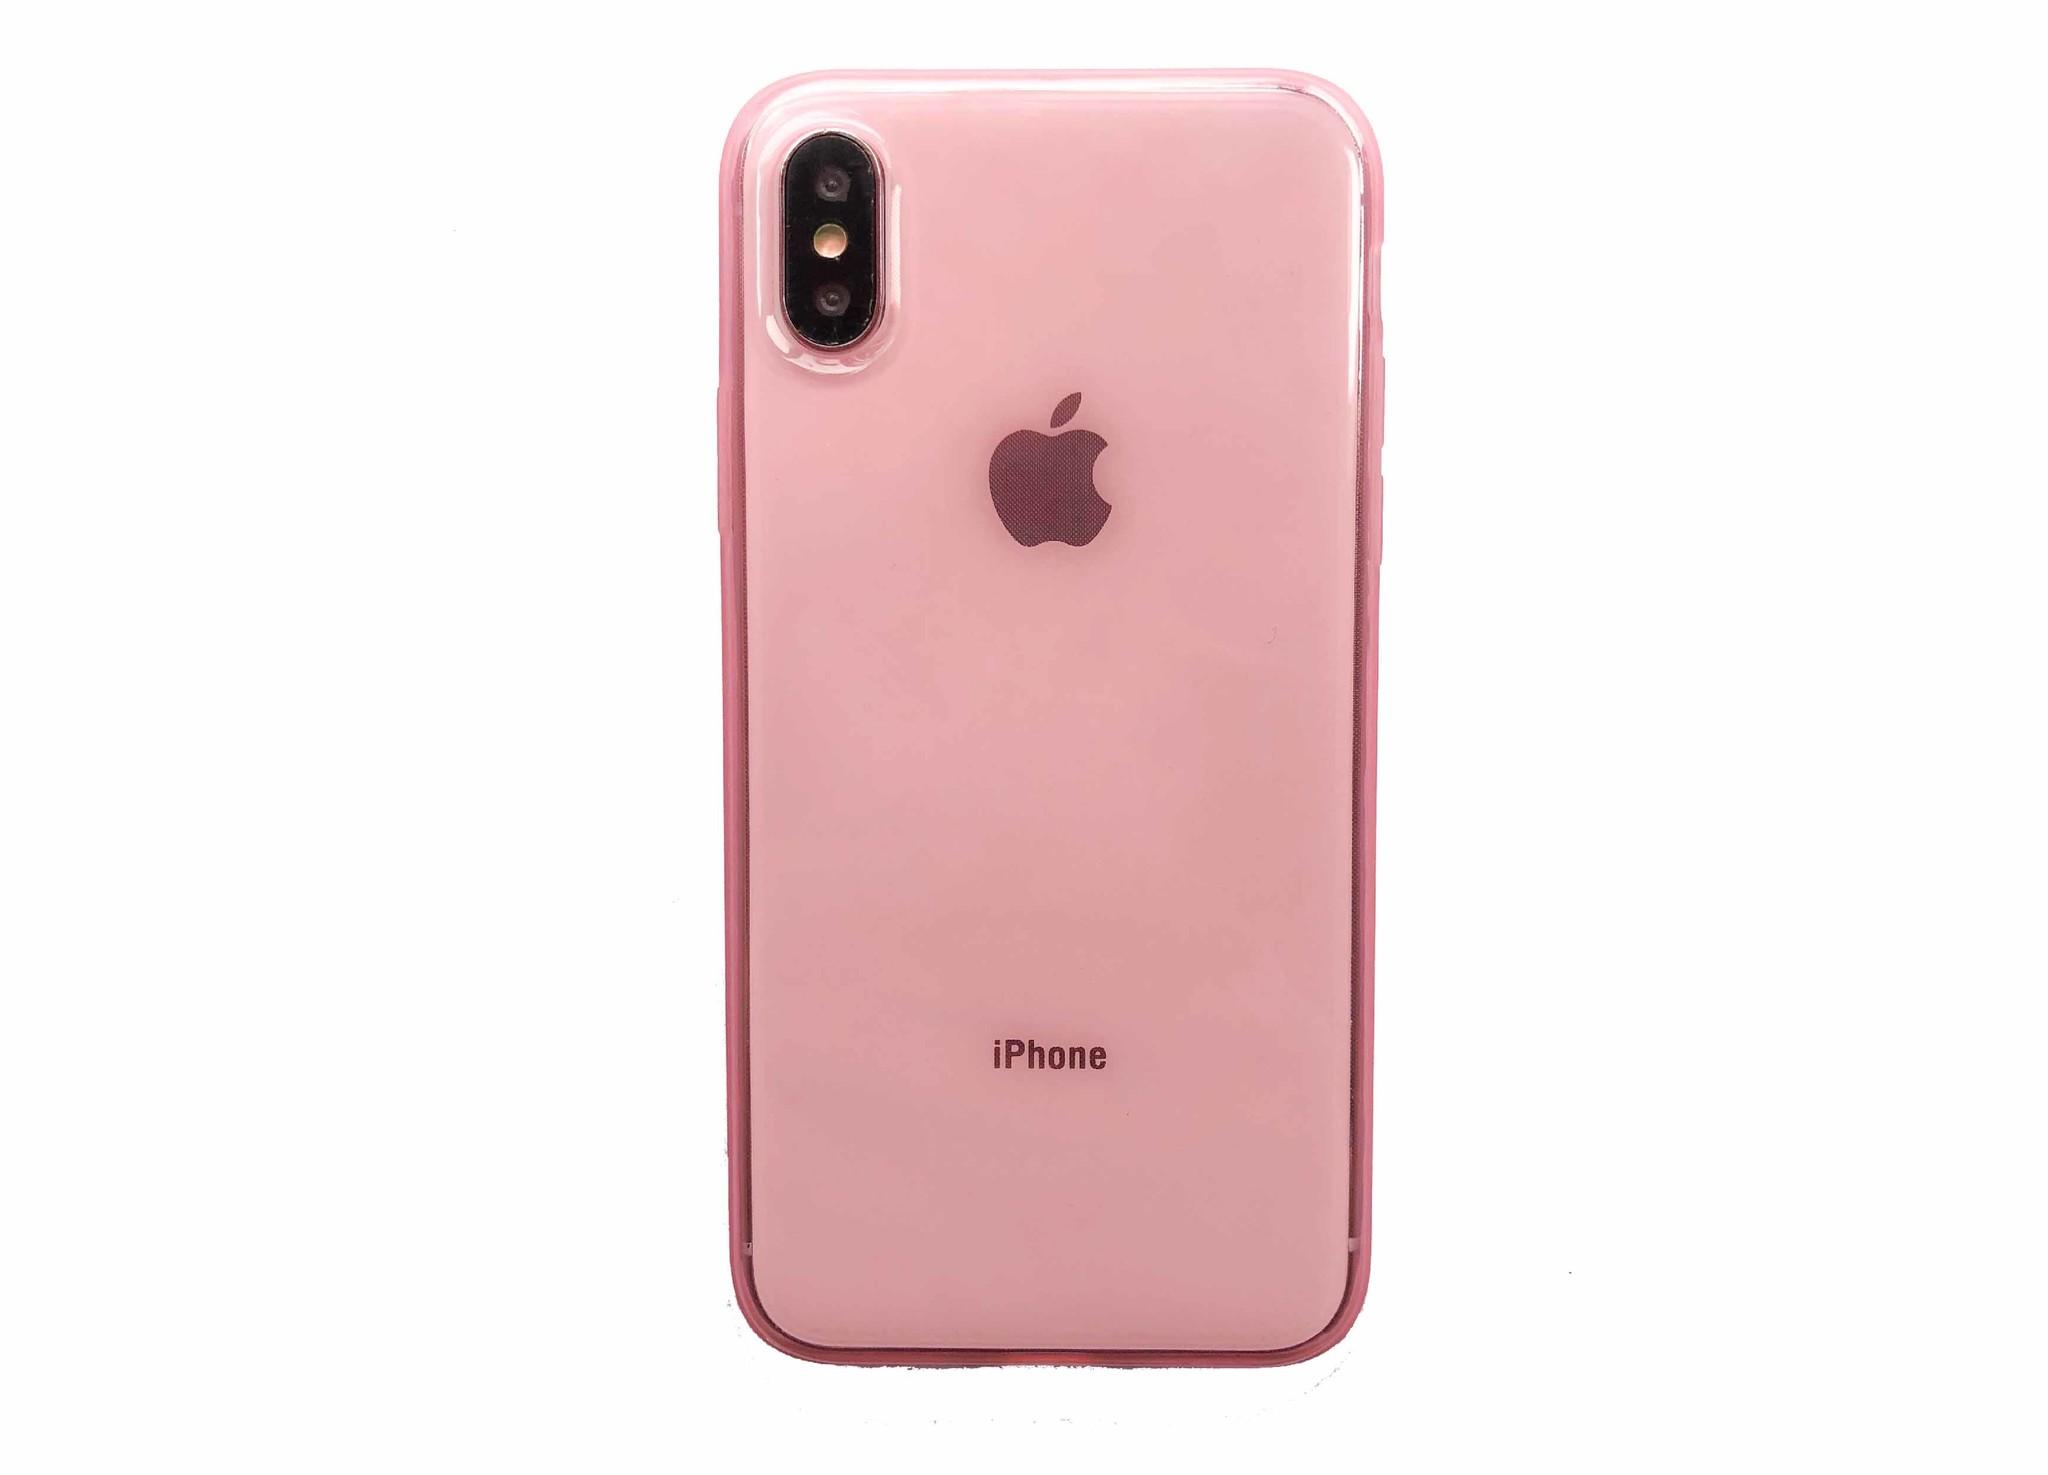 Smartphonehoesje iPhone 7/8 | Roze / transparant